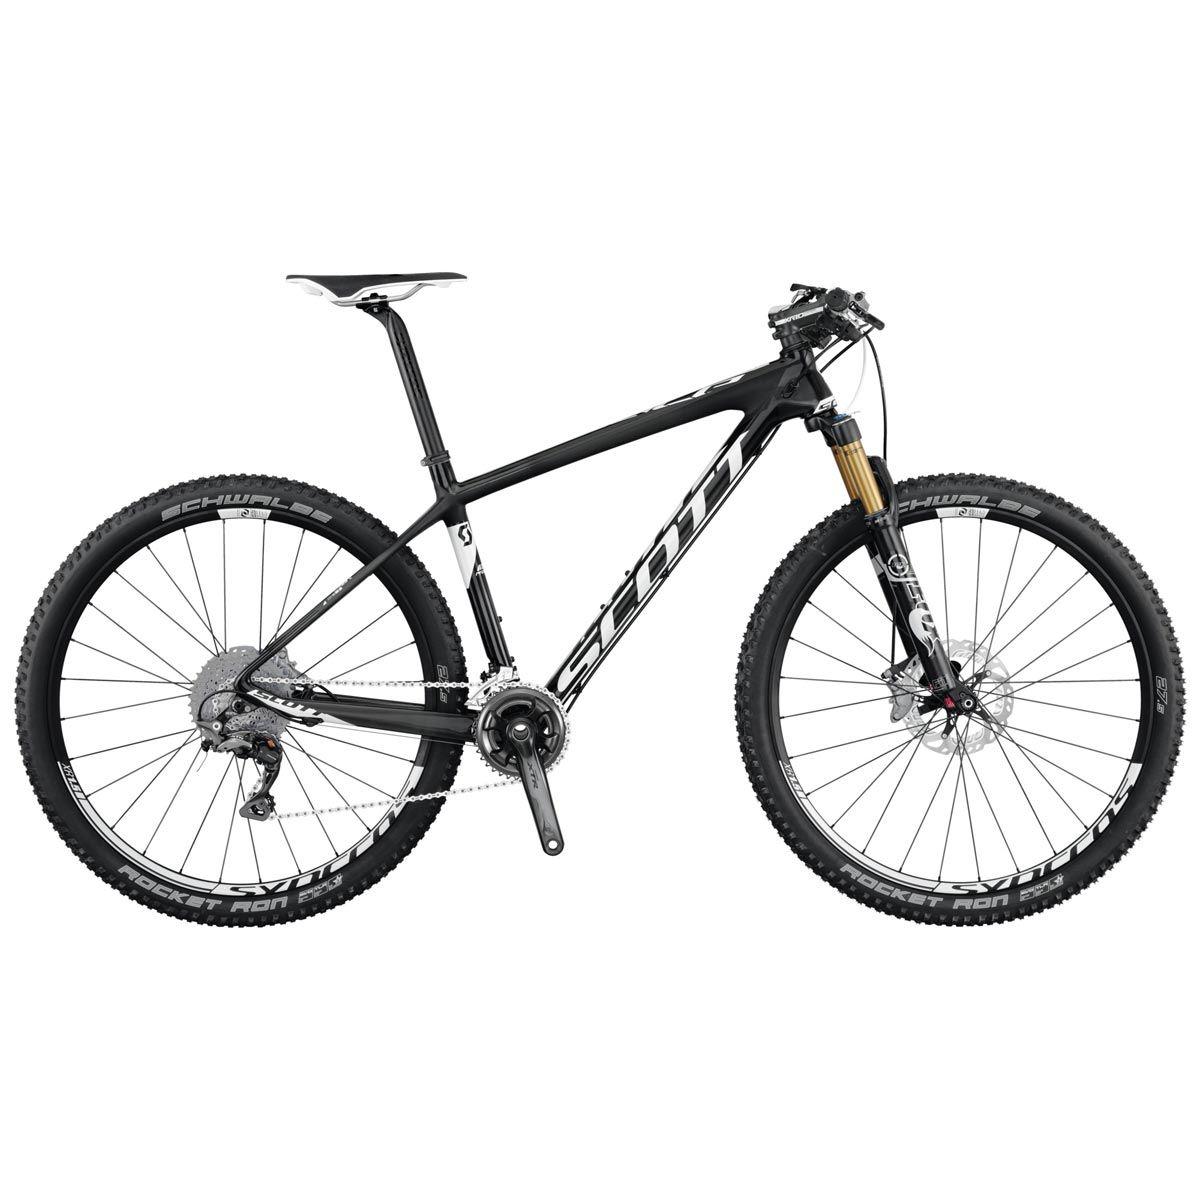 Scott Scale 700 Premium 27 5 Inch 2015 Carbon Hardtail Mountain